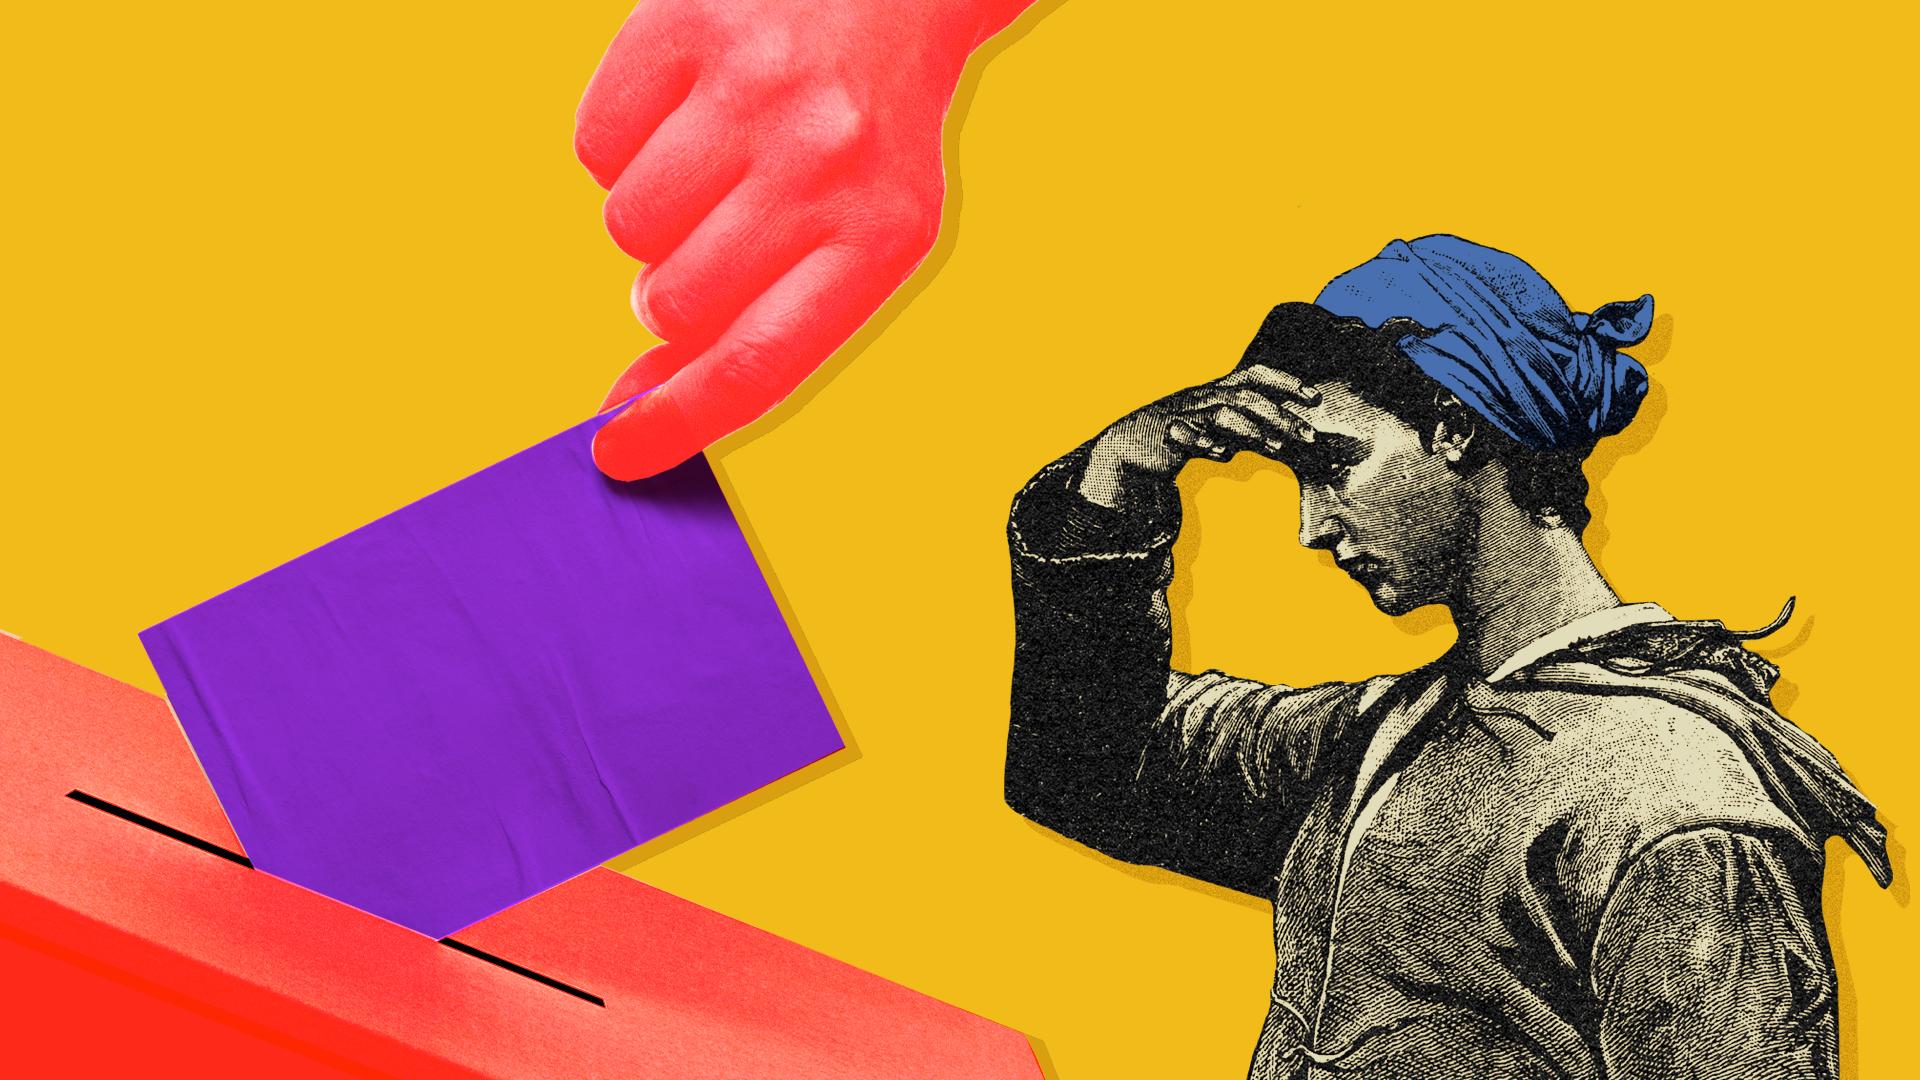 Voting box illustration